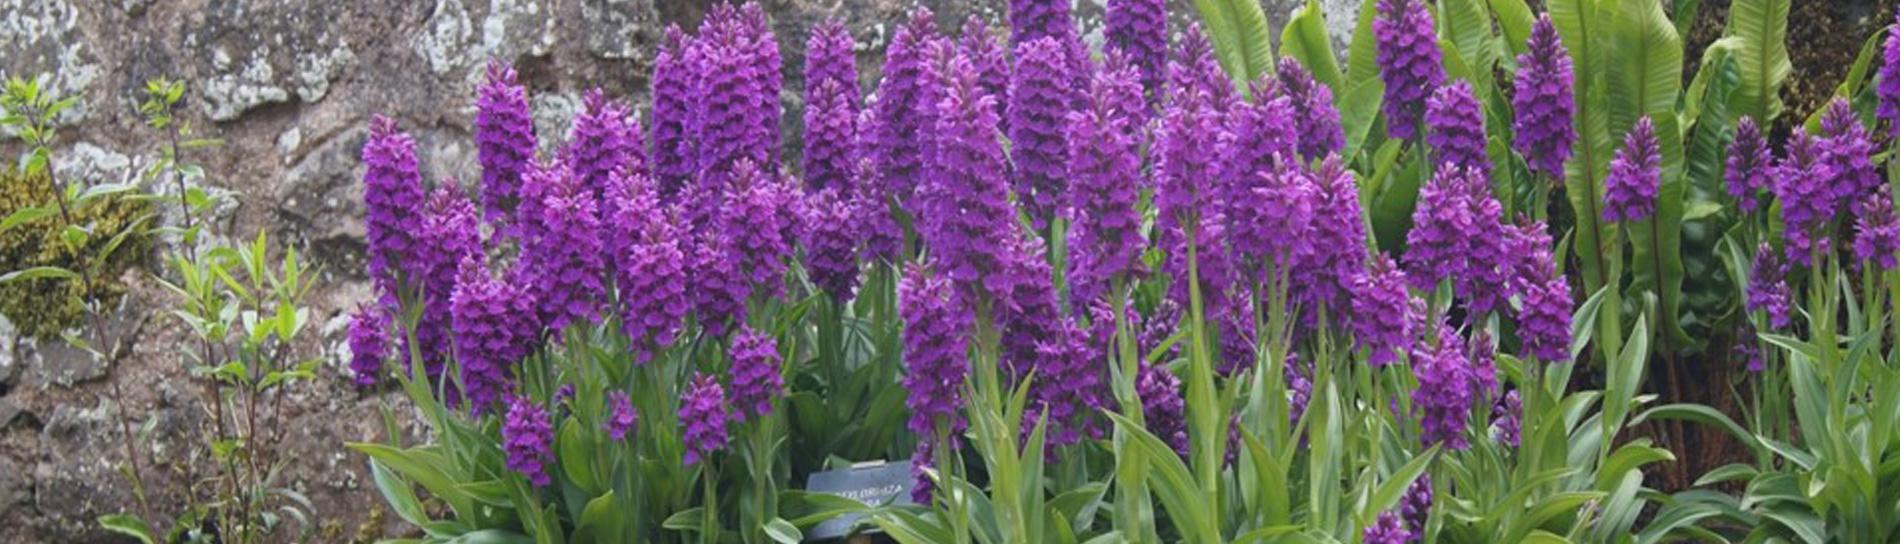 John-Horsey-Horticulture-Gardening-Axminster